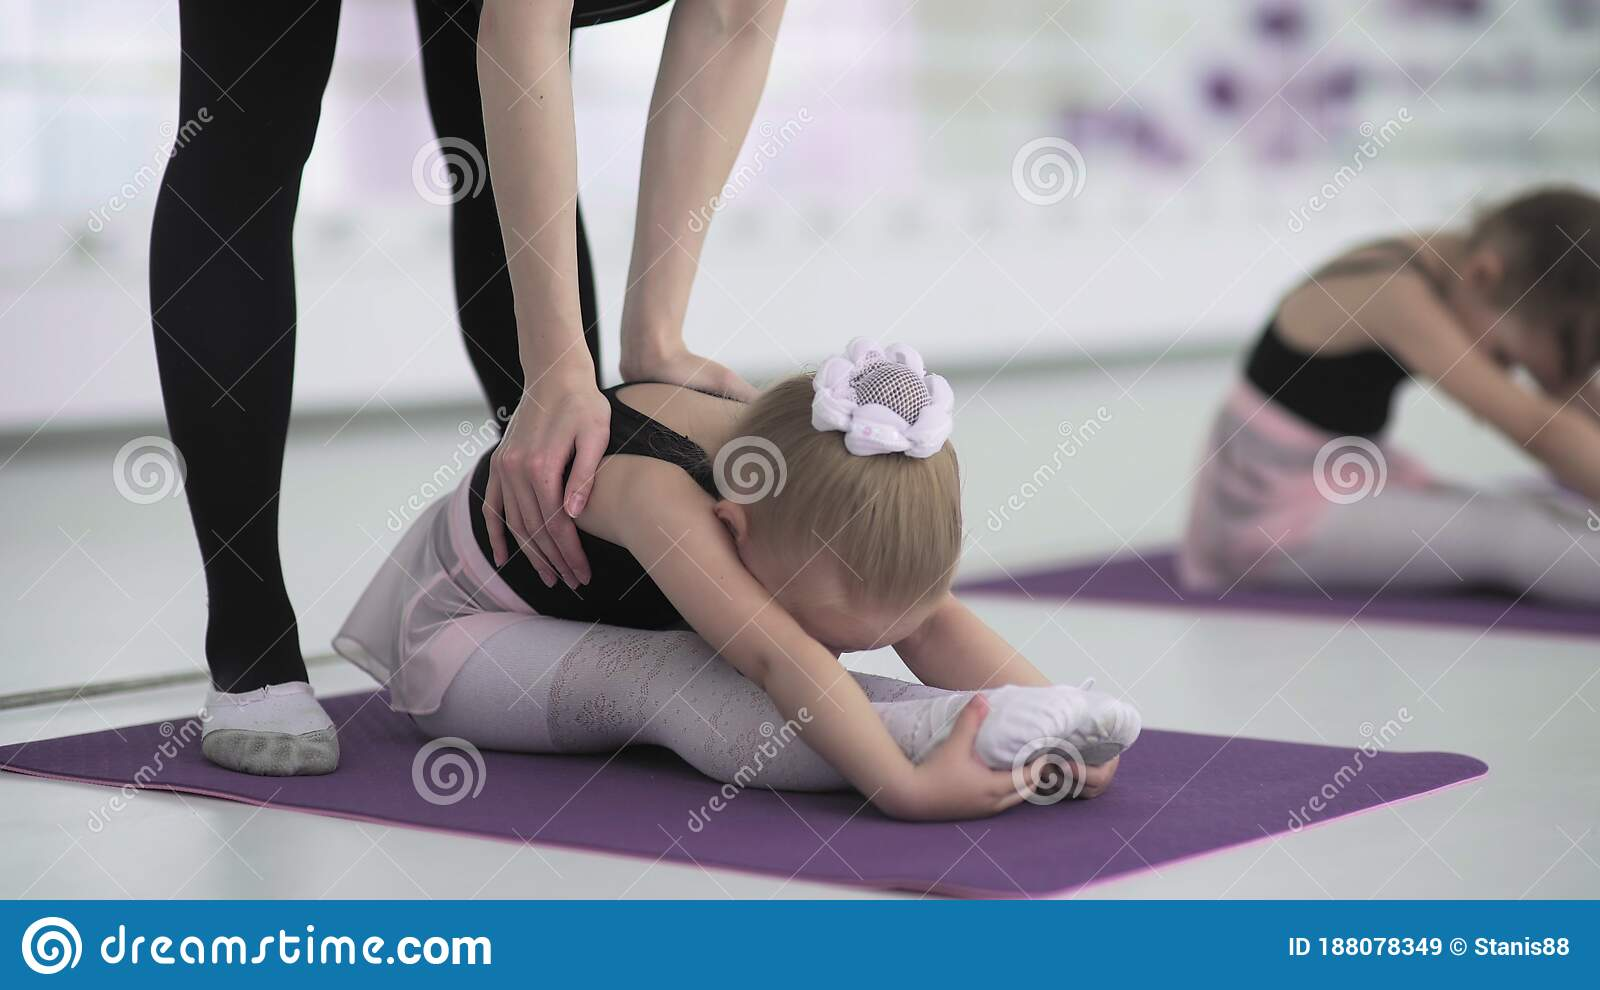 stock-photo-flexible-ballet-dancer-stretching-in-the-dark